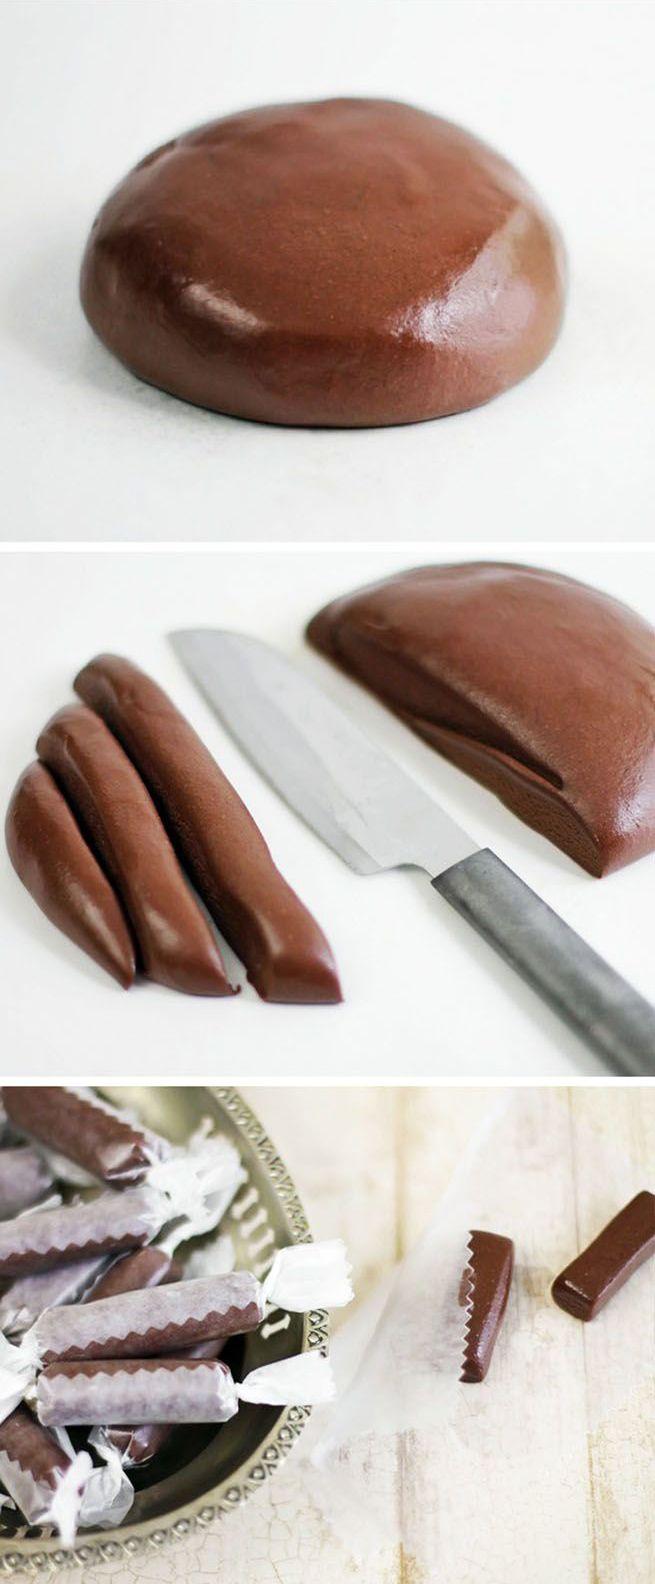 Homemade Tootsie Rolls | Food52